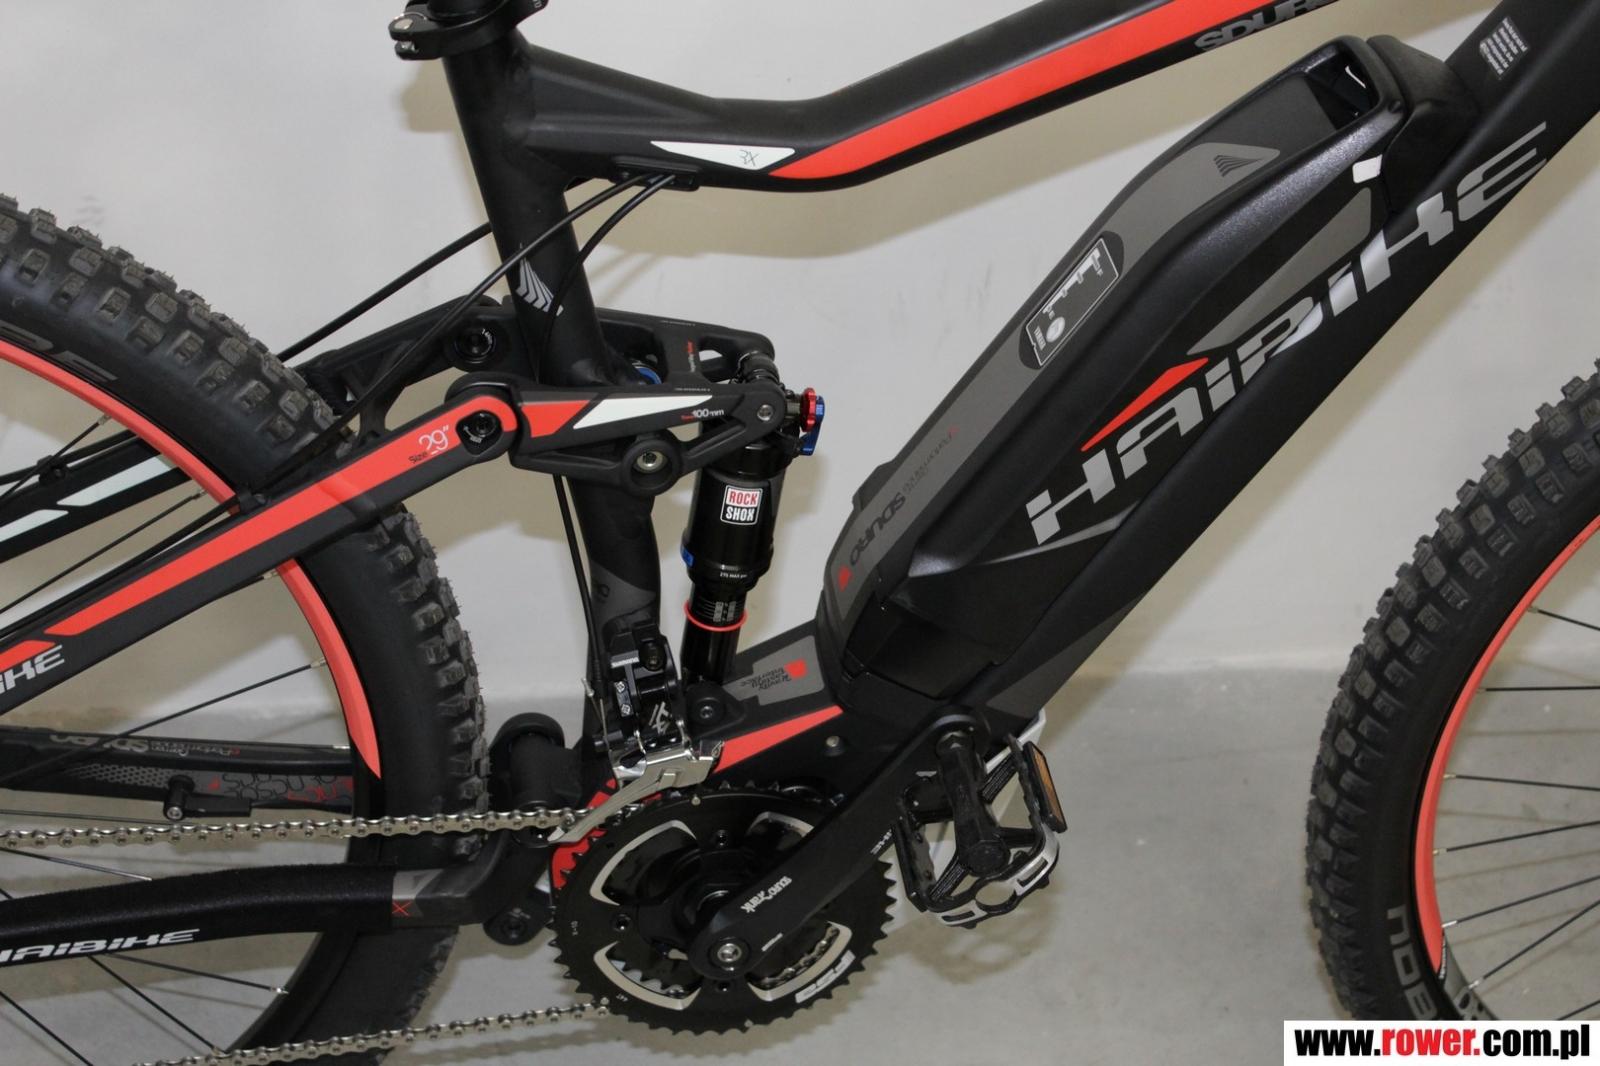 e4a98afdd3251d Haibike SDURO FullNine RX (2015) - 14499.00 zł. Sklep rowerowy ...